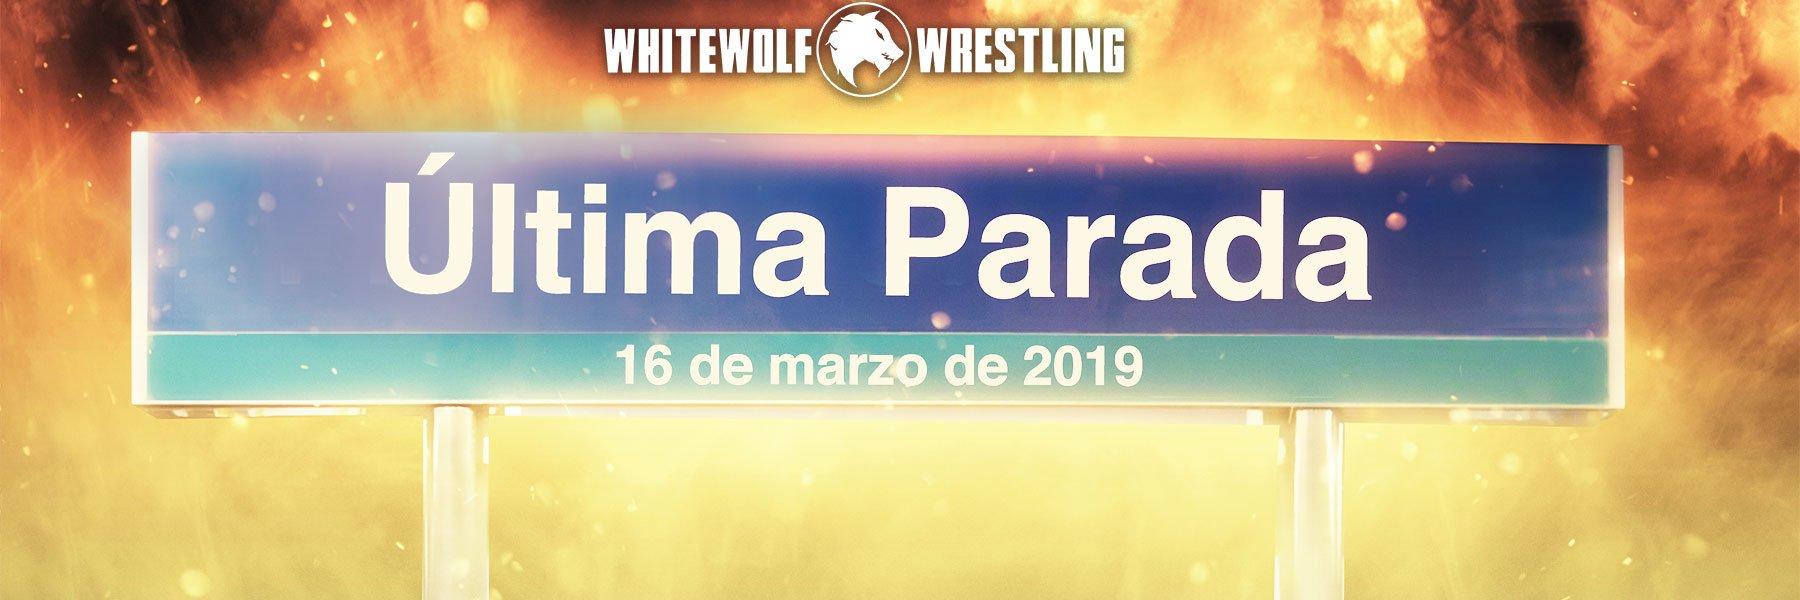 Última Parada - Full Show - 16/03/2019